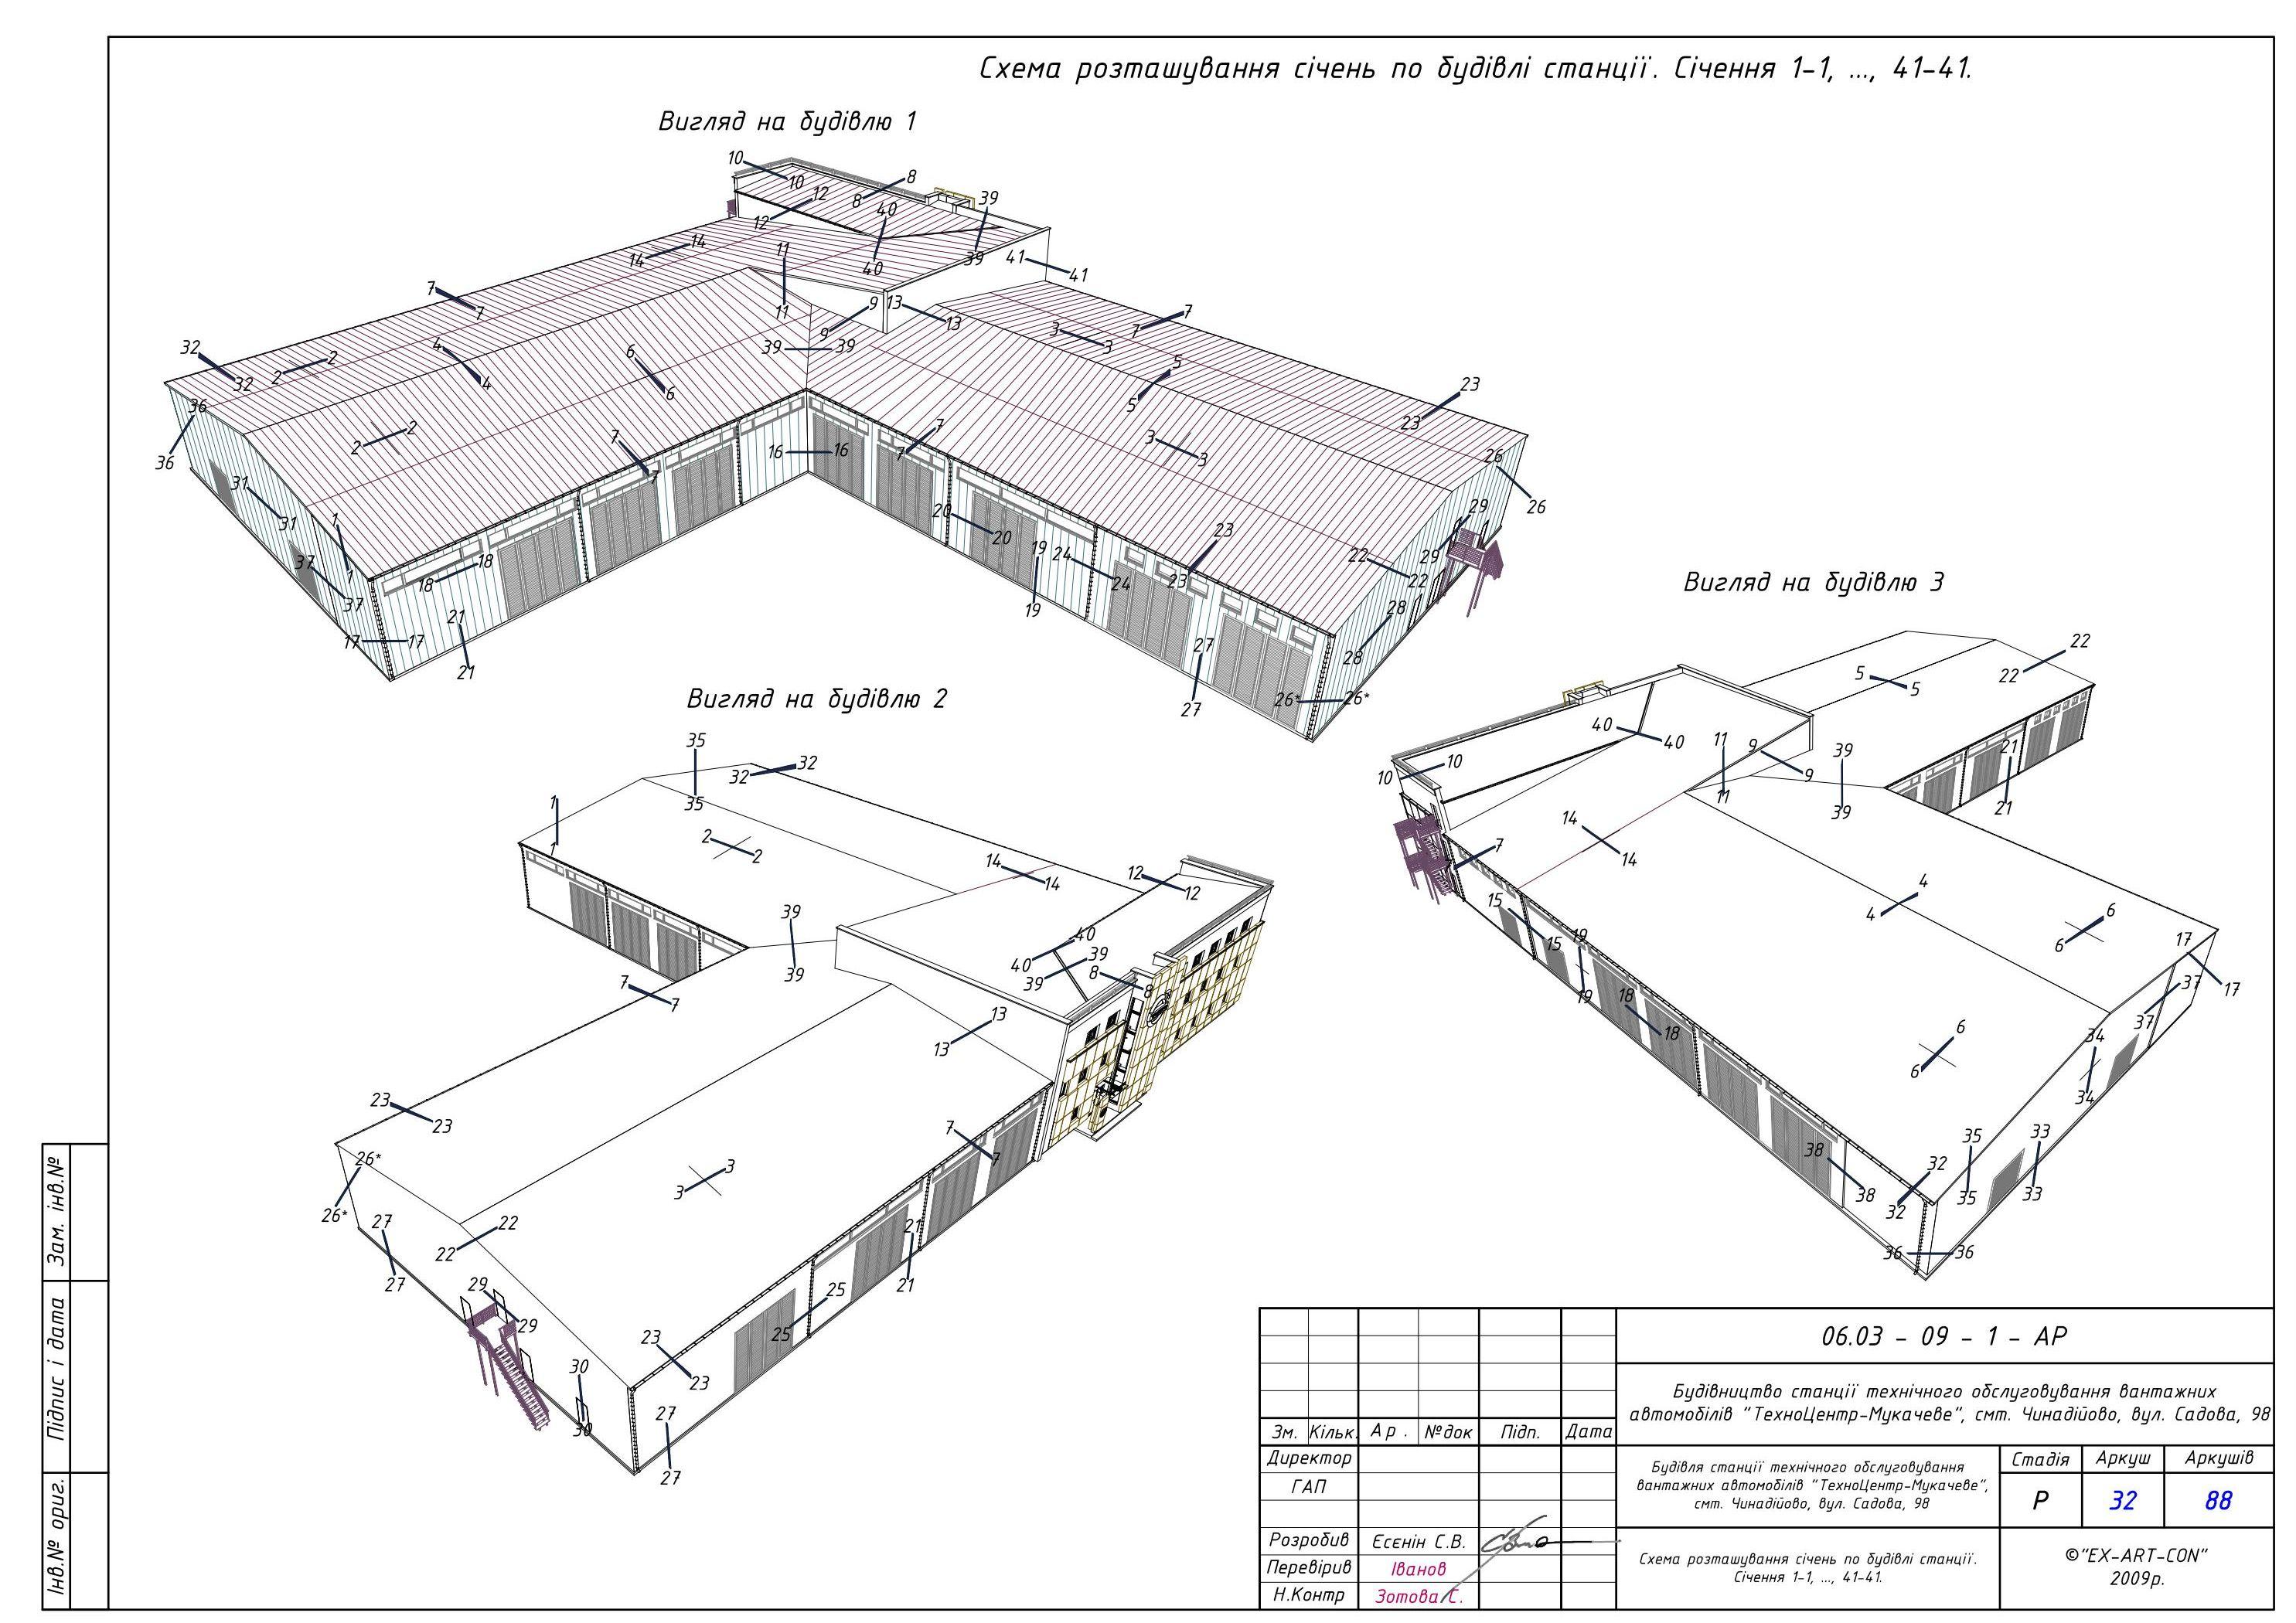 план схема станция технического обслуживания чертеж